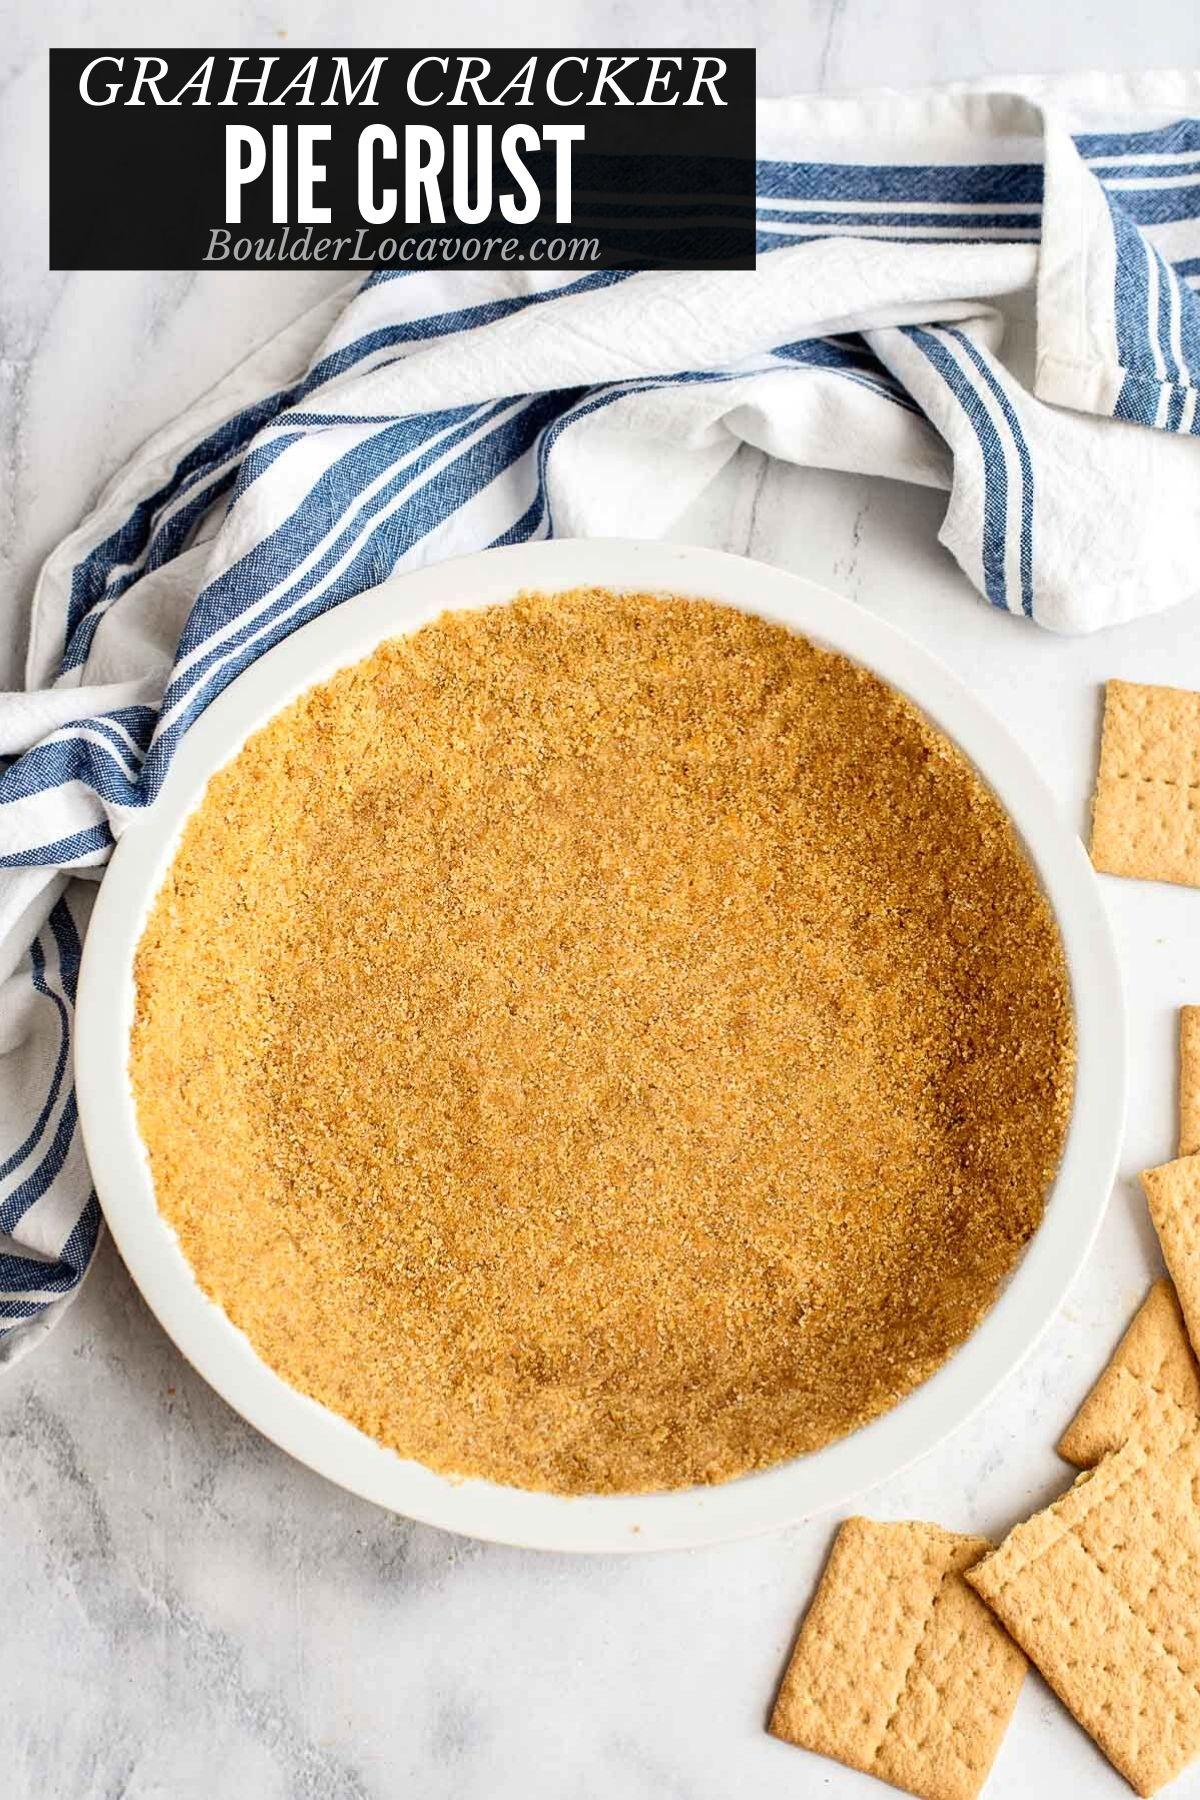 Graham Cracker crust title